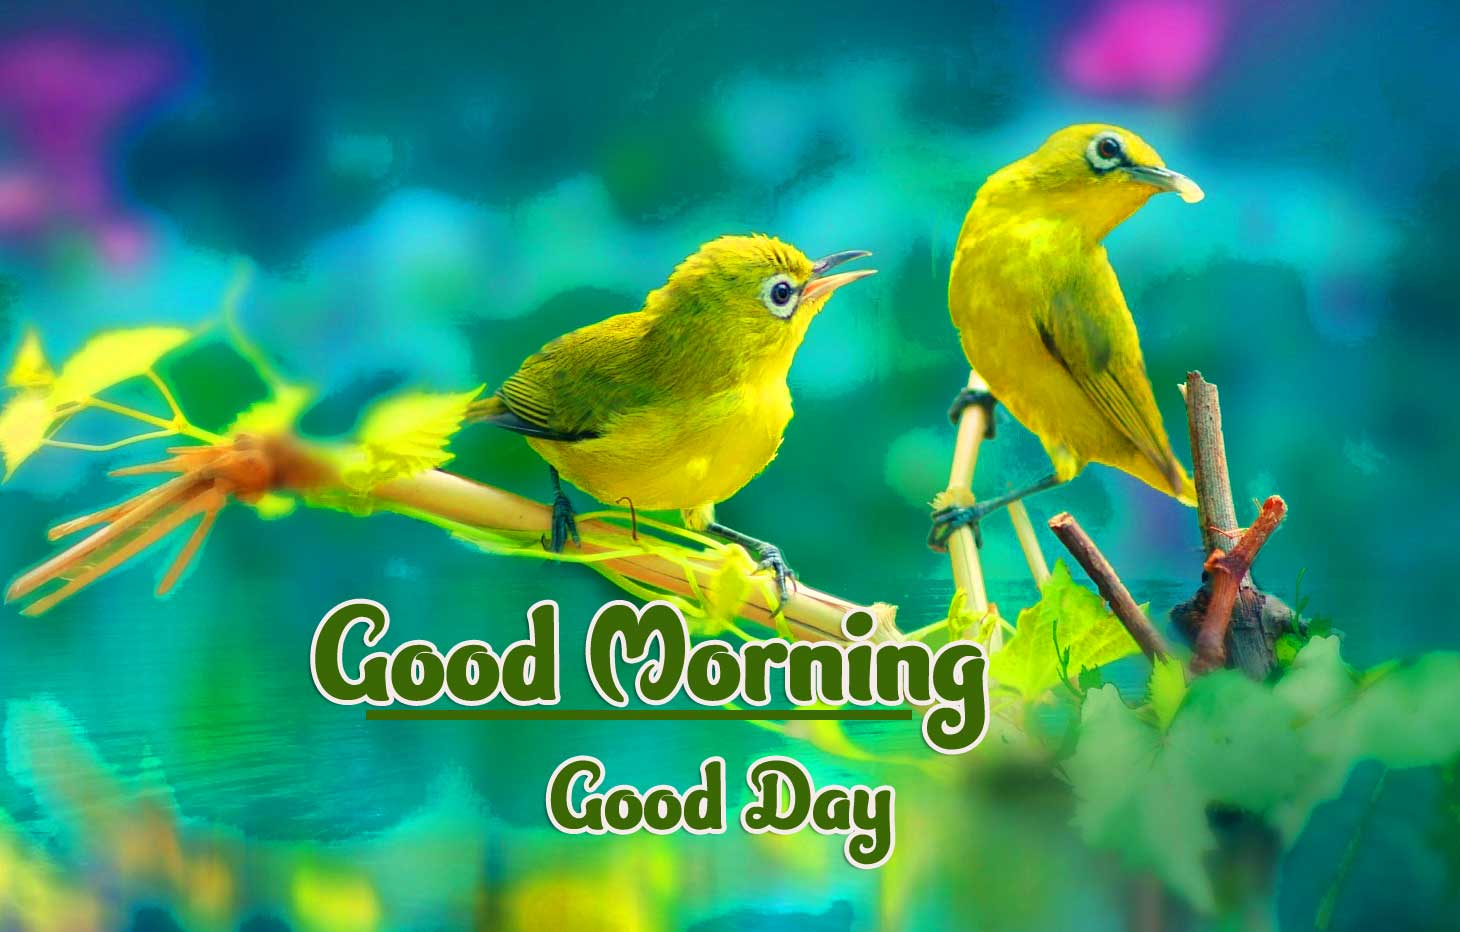 Full HD Free Good Morning Wallpaper Pic Download